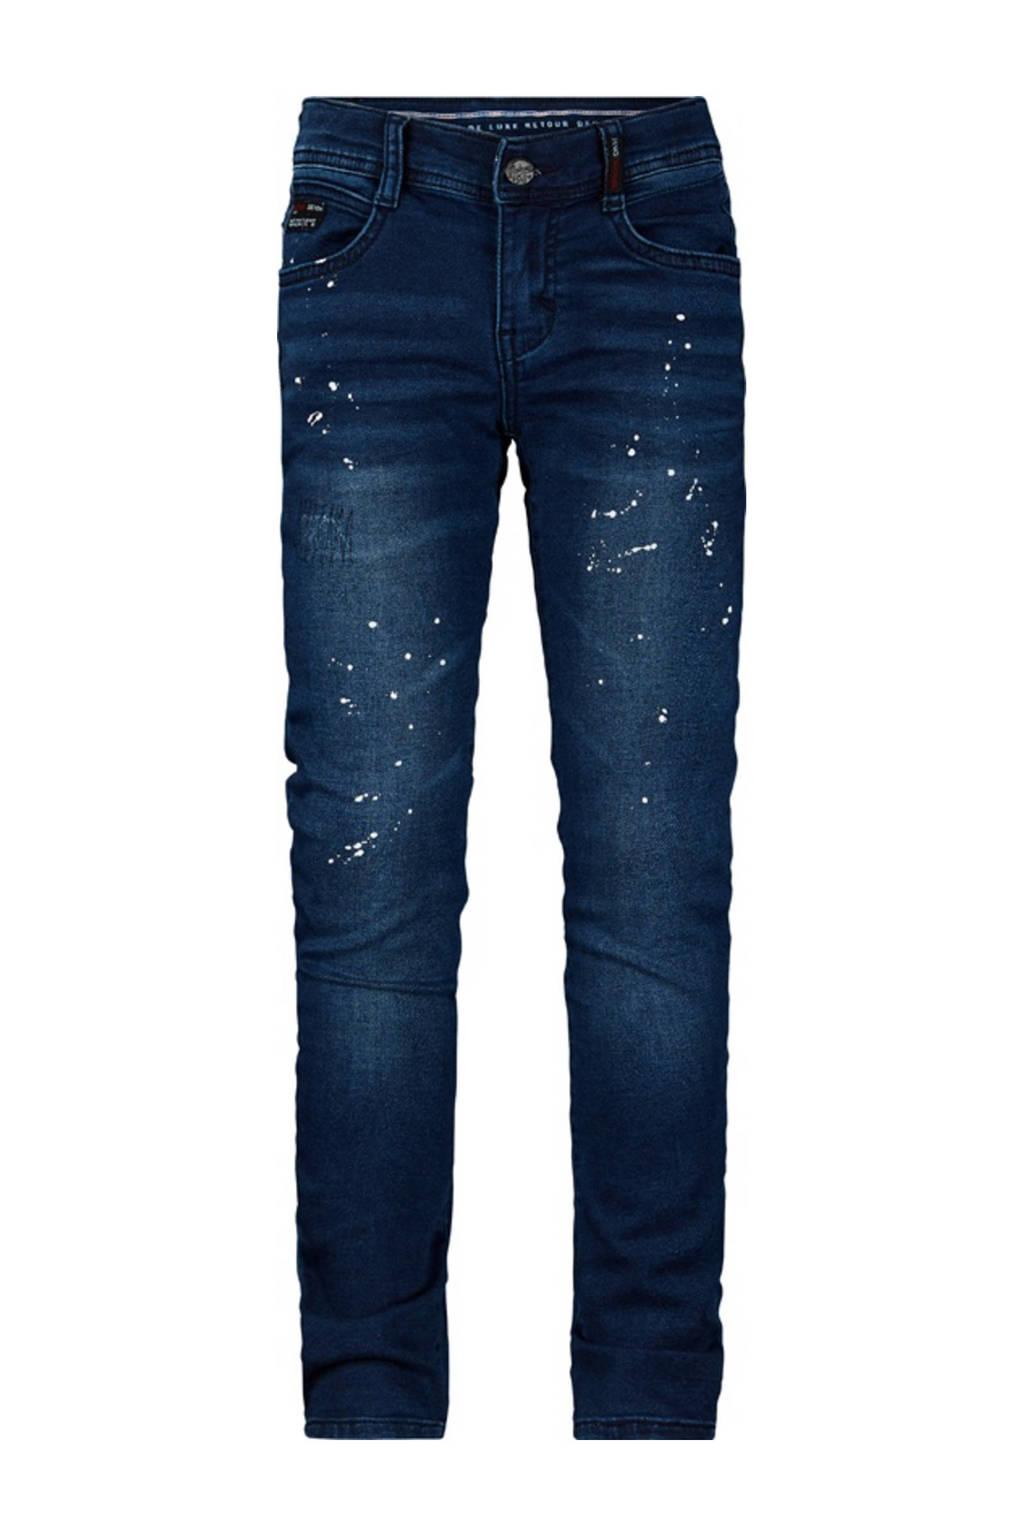 Retour Denim slim fit jeans Robby vintage blue denim, Vintage blue denim